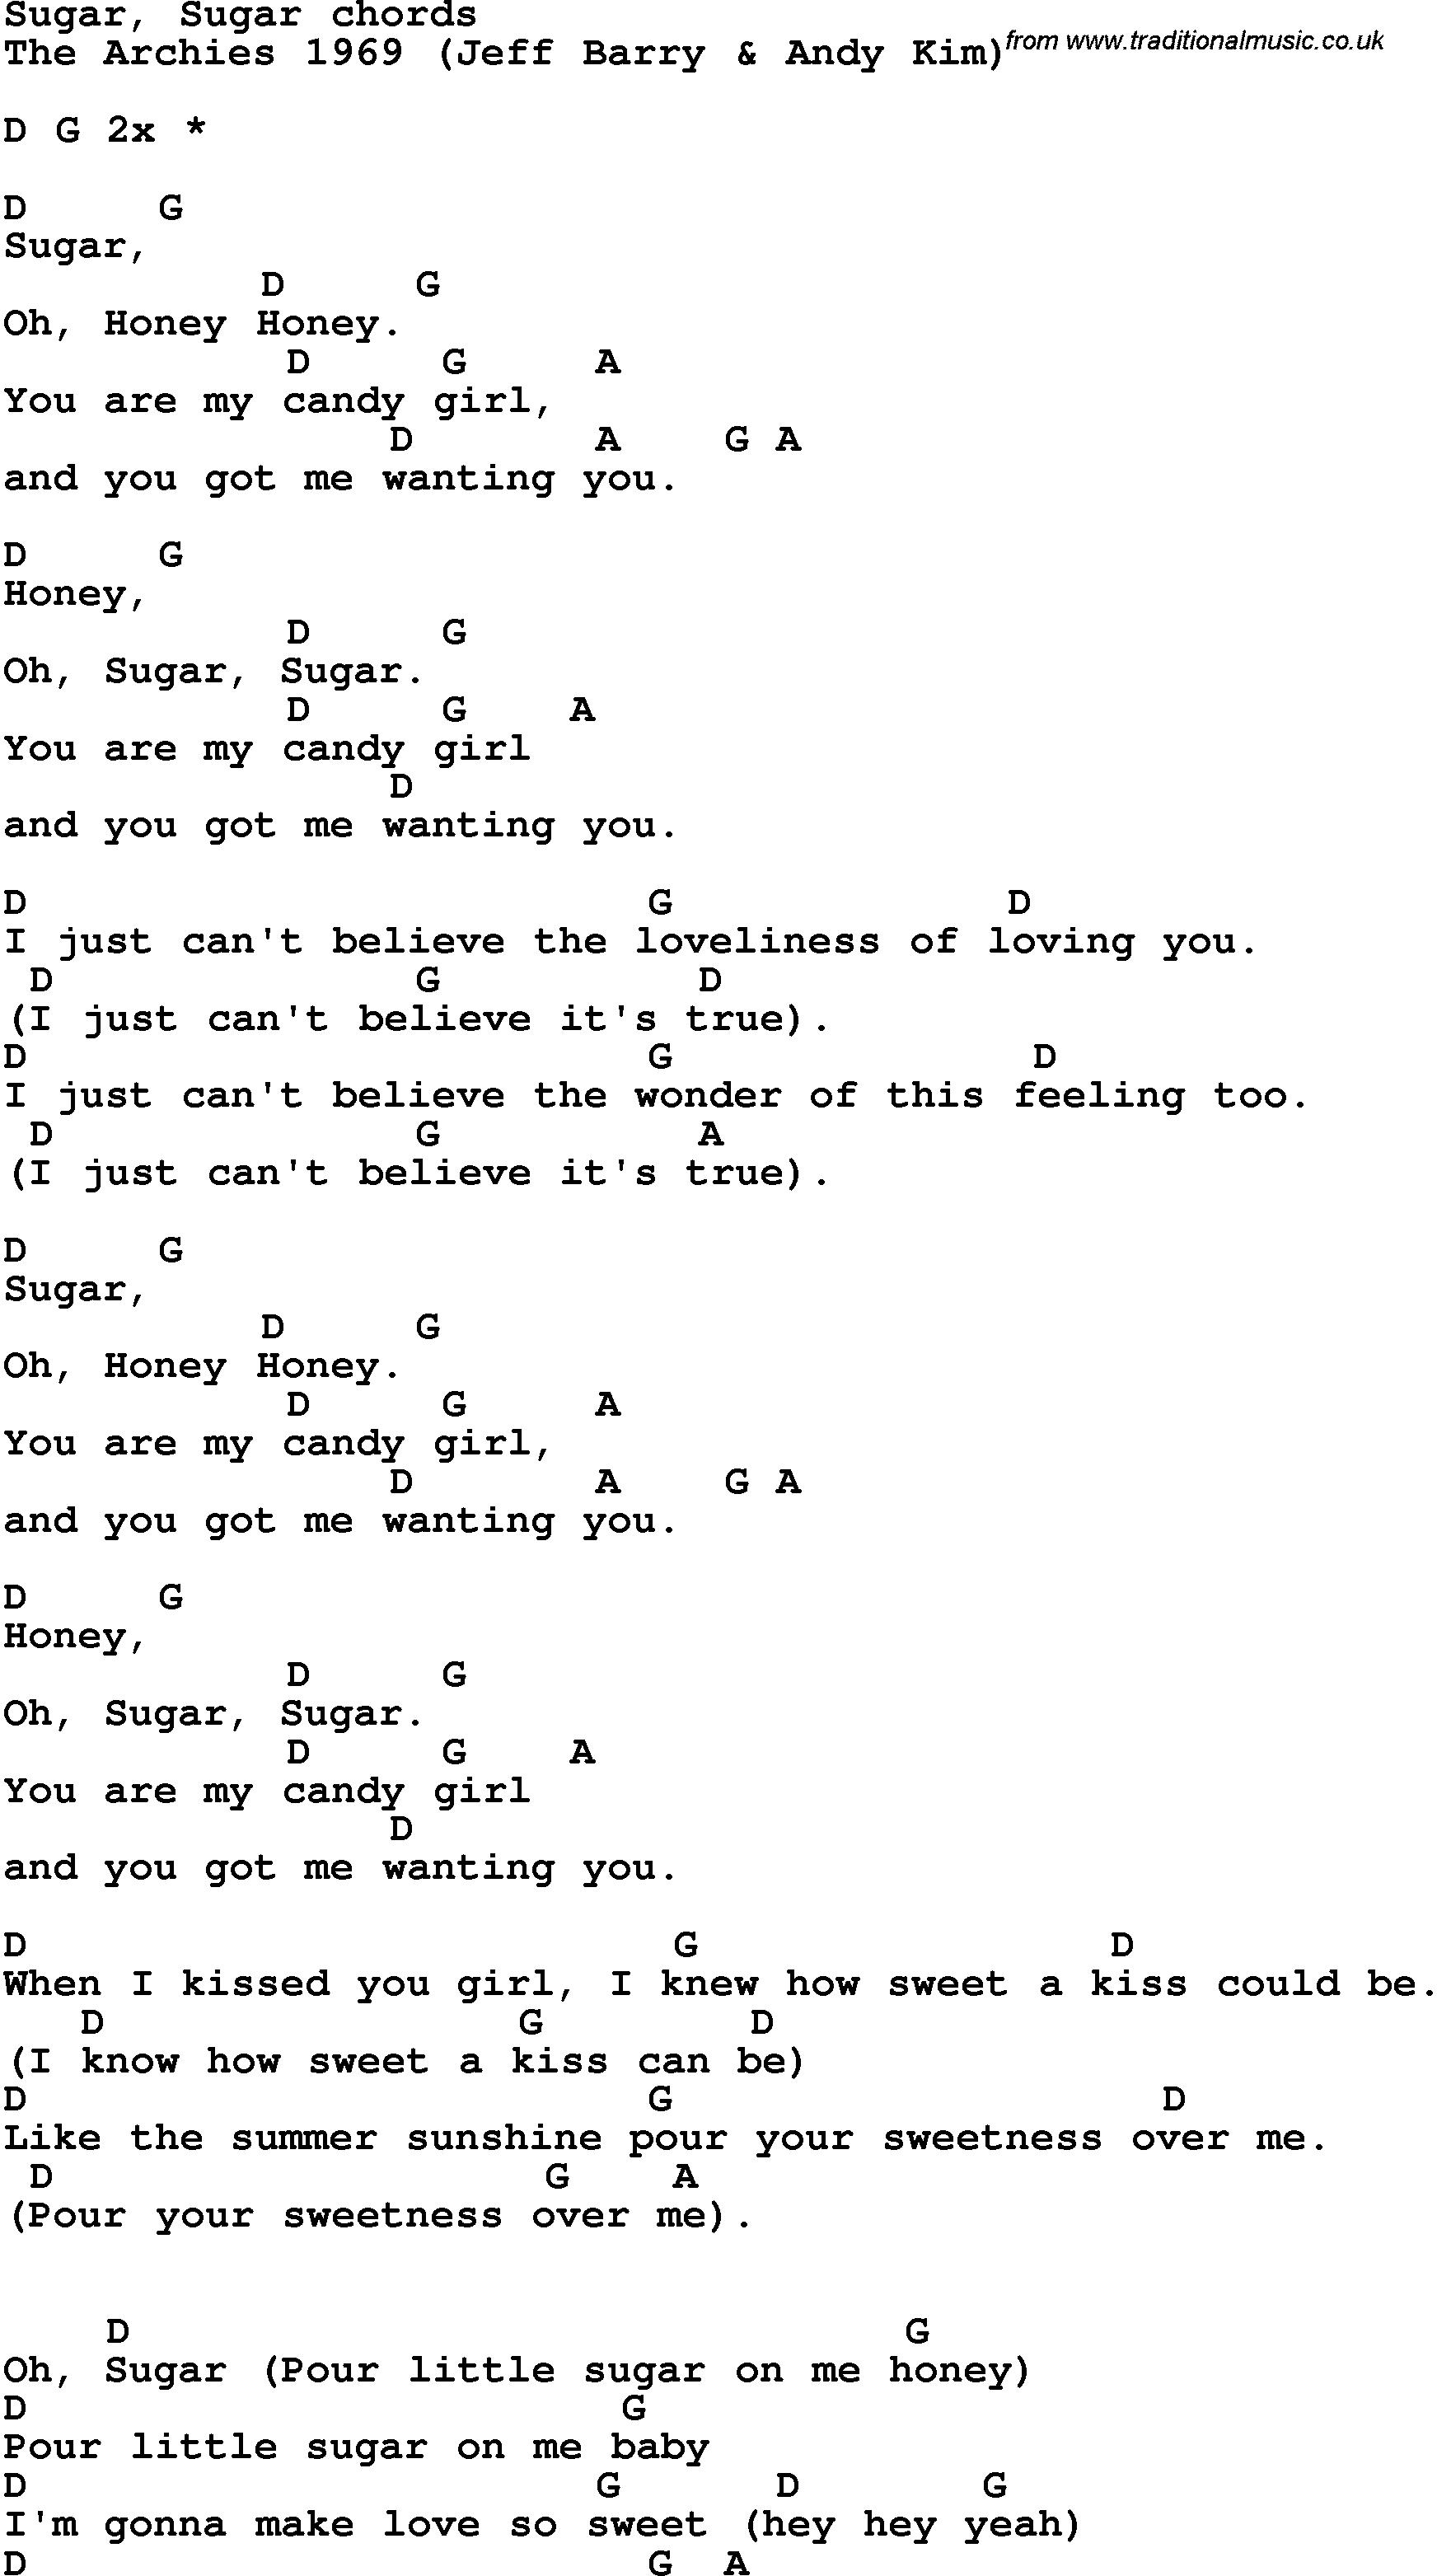 Song Lyrics With Guitar Chords For Sugar, Sugar | Guitar Class In - Free Printable Song Lyrics With Guitar Chords